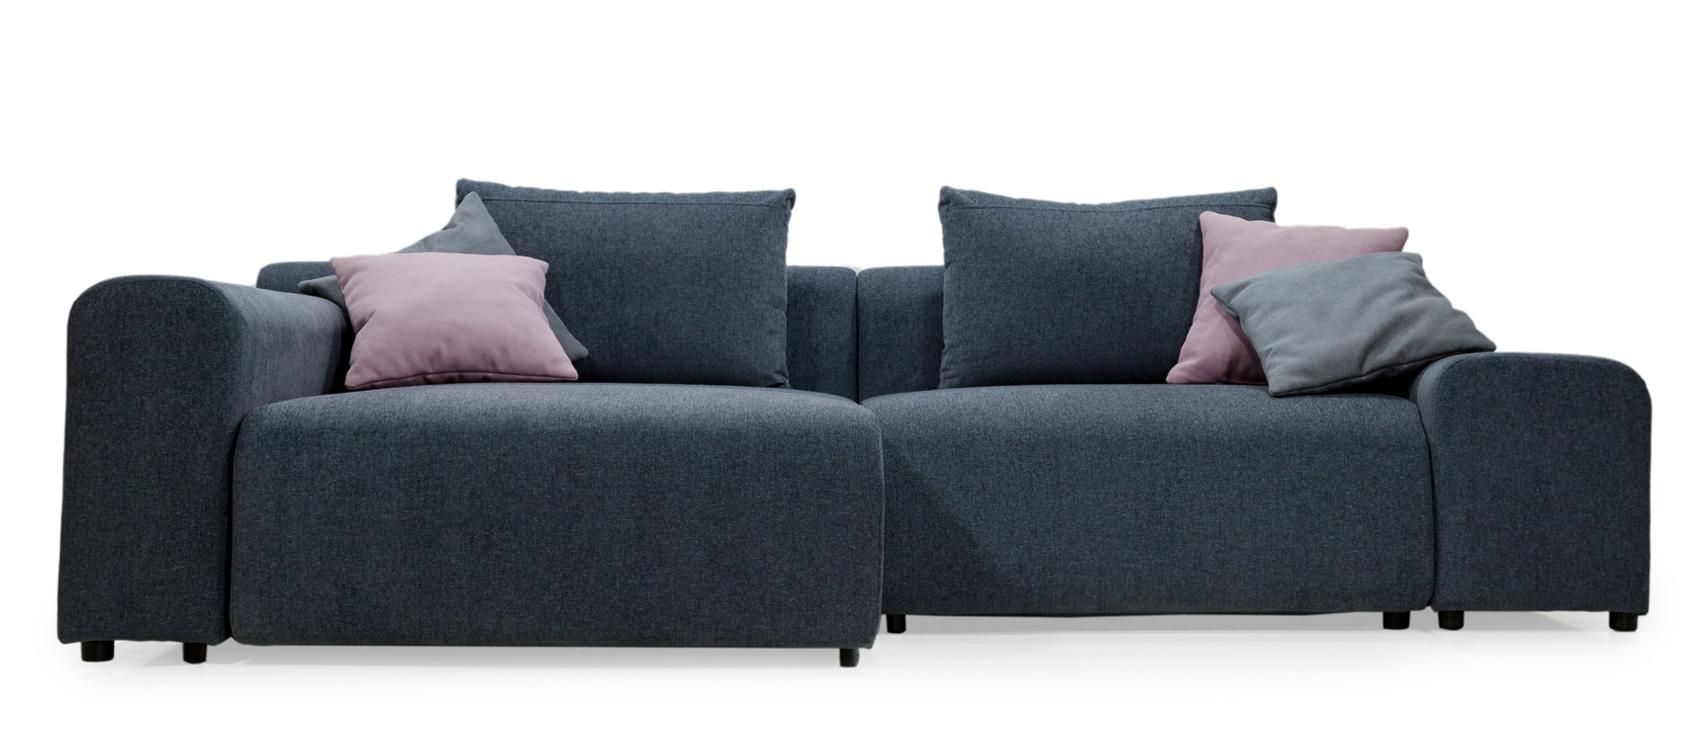 Sofa RAFT фото 11